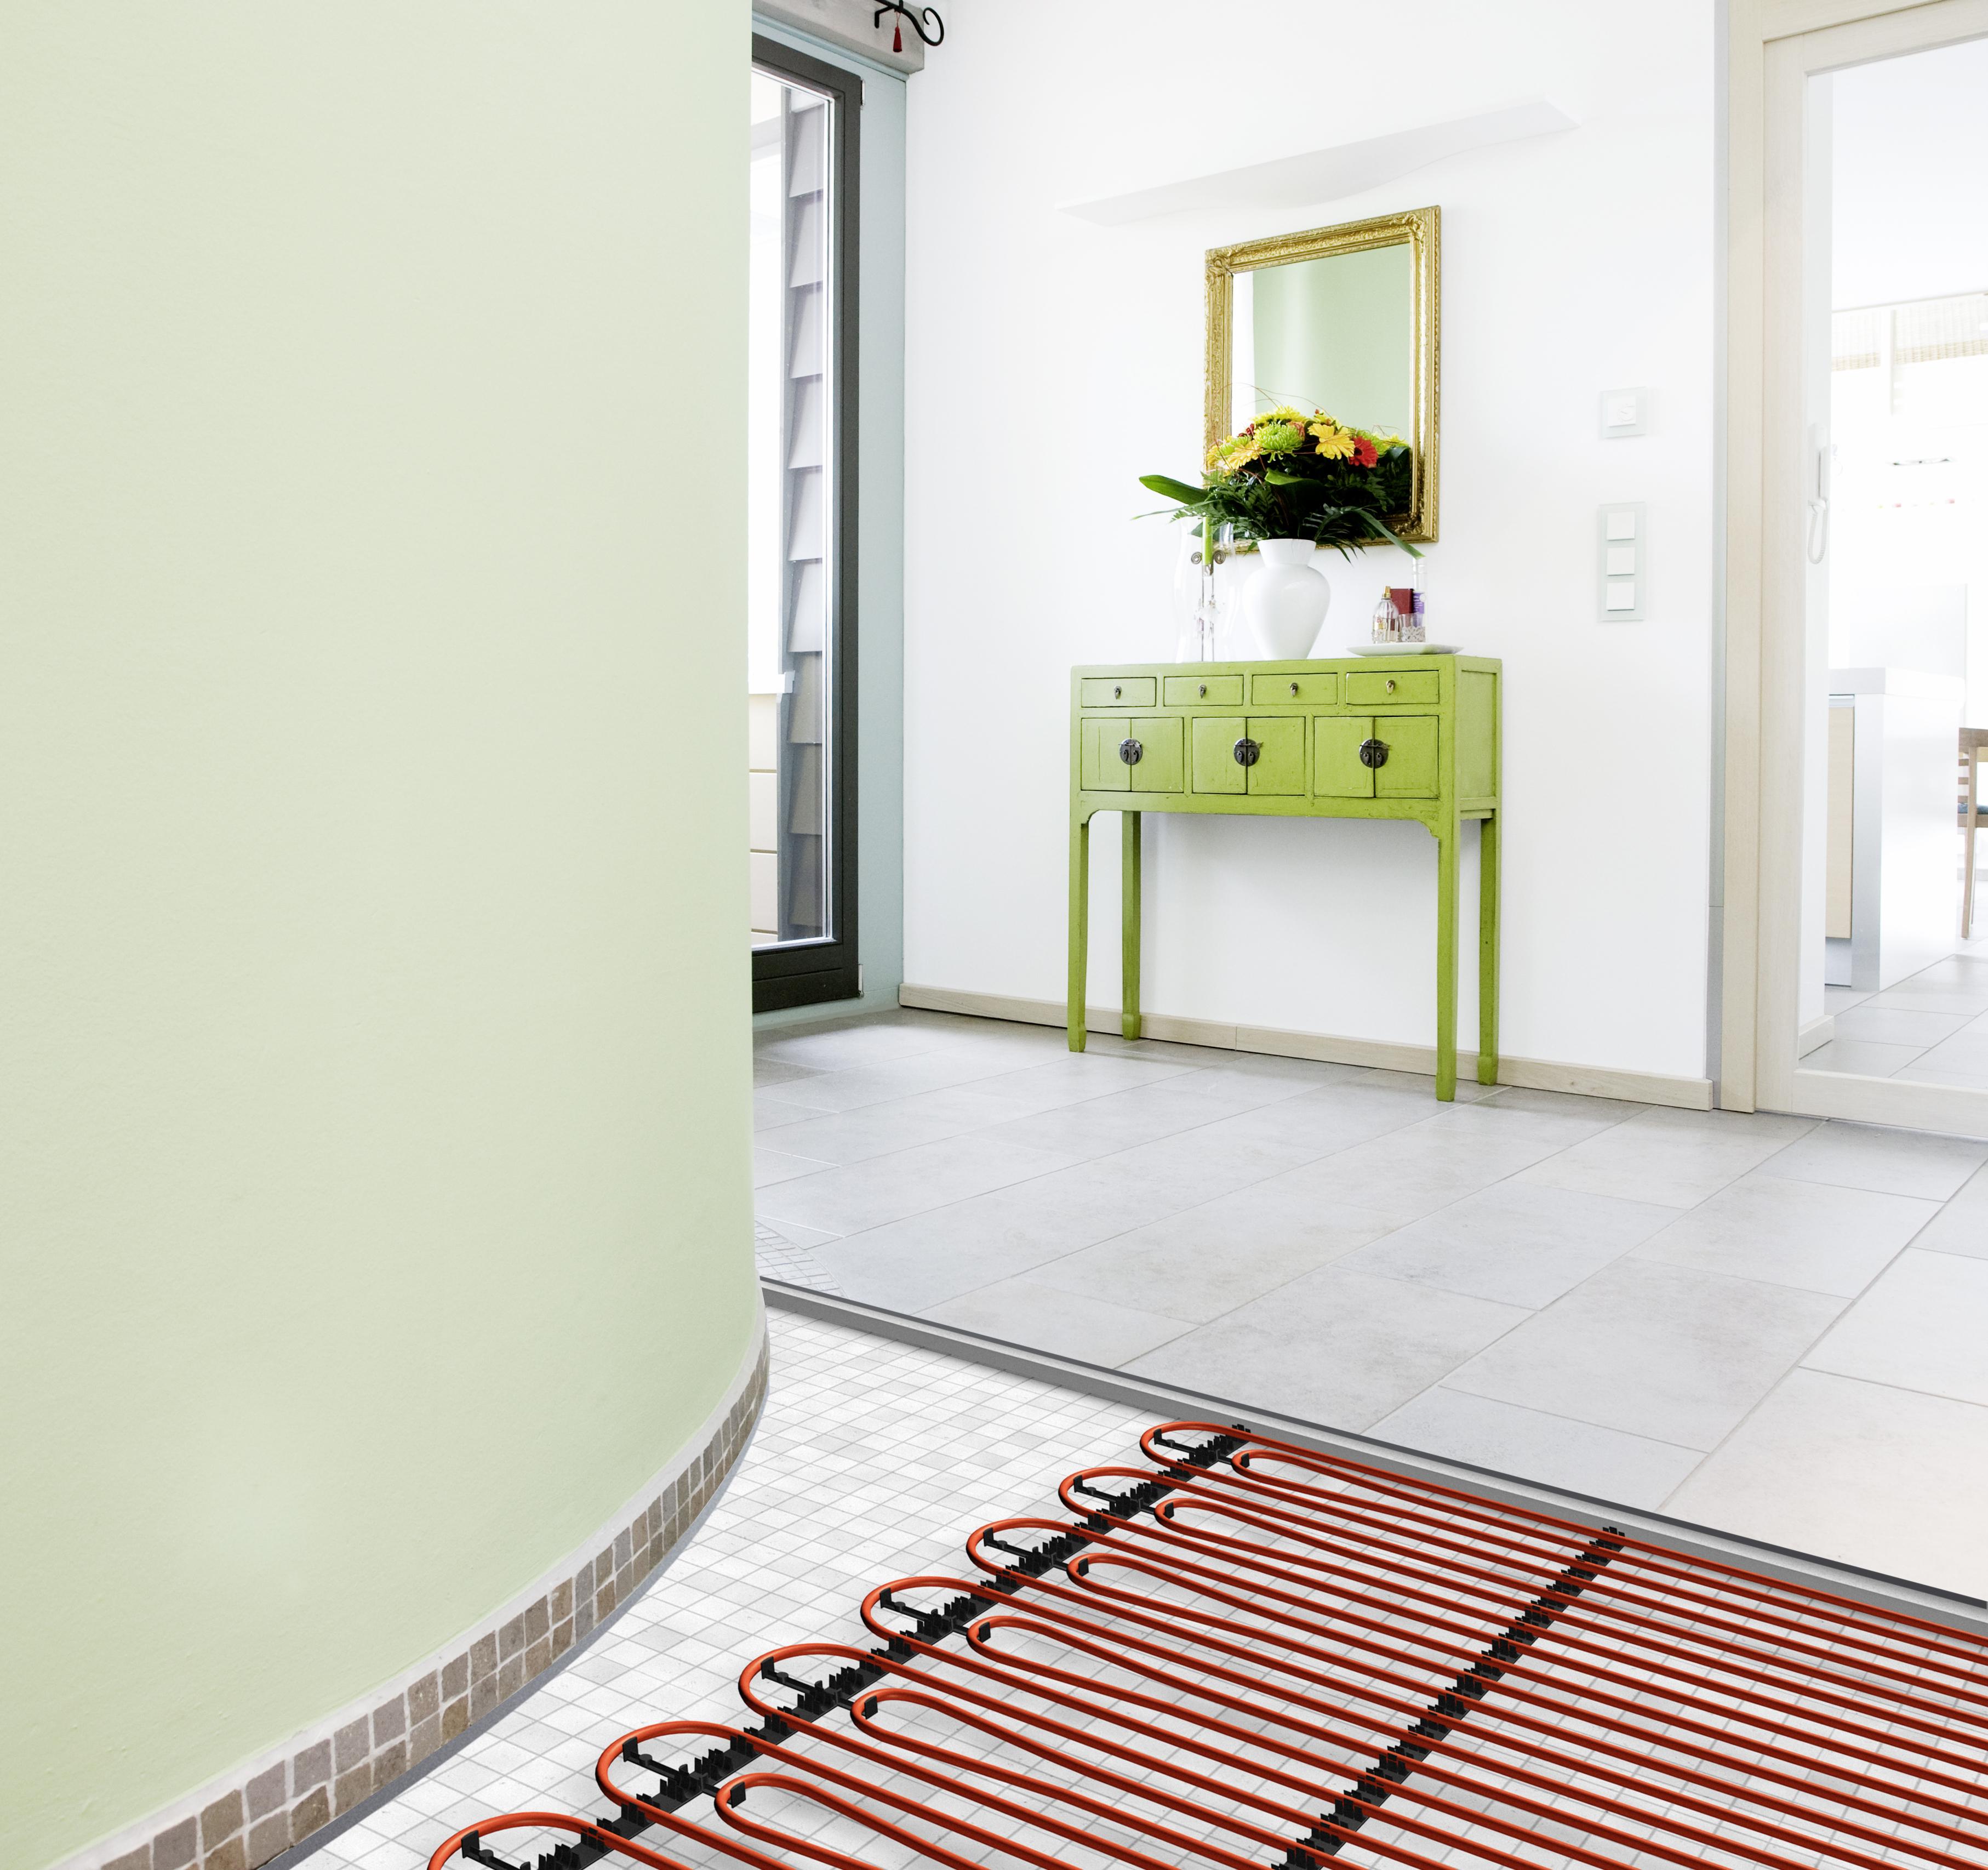 underfloor heating REHAU